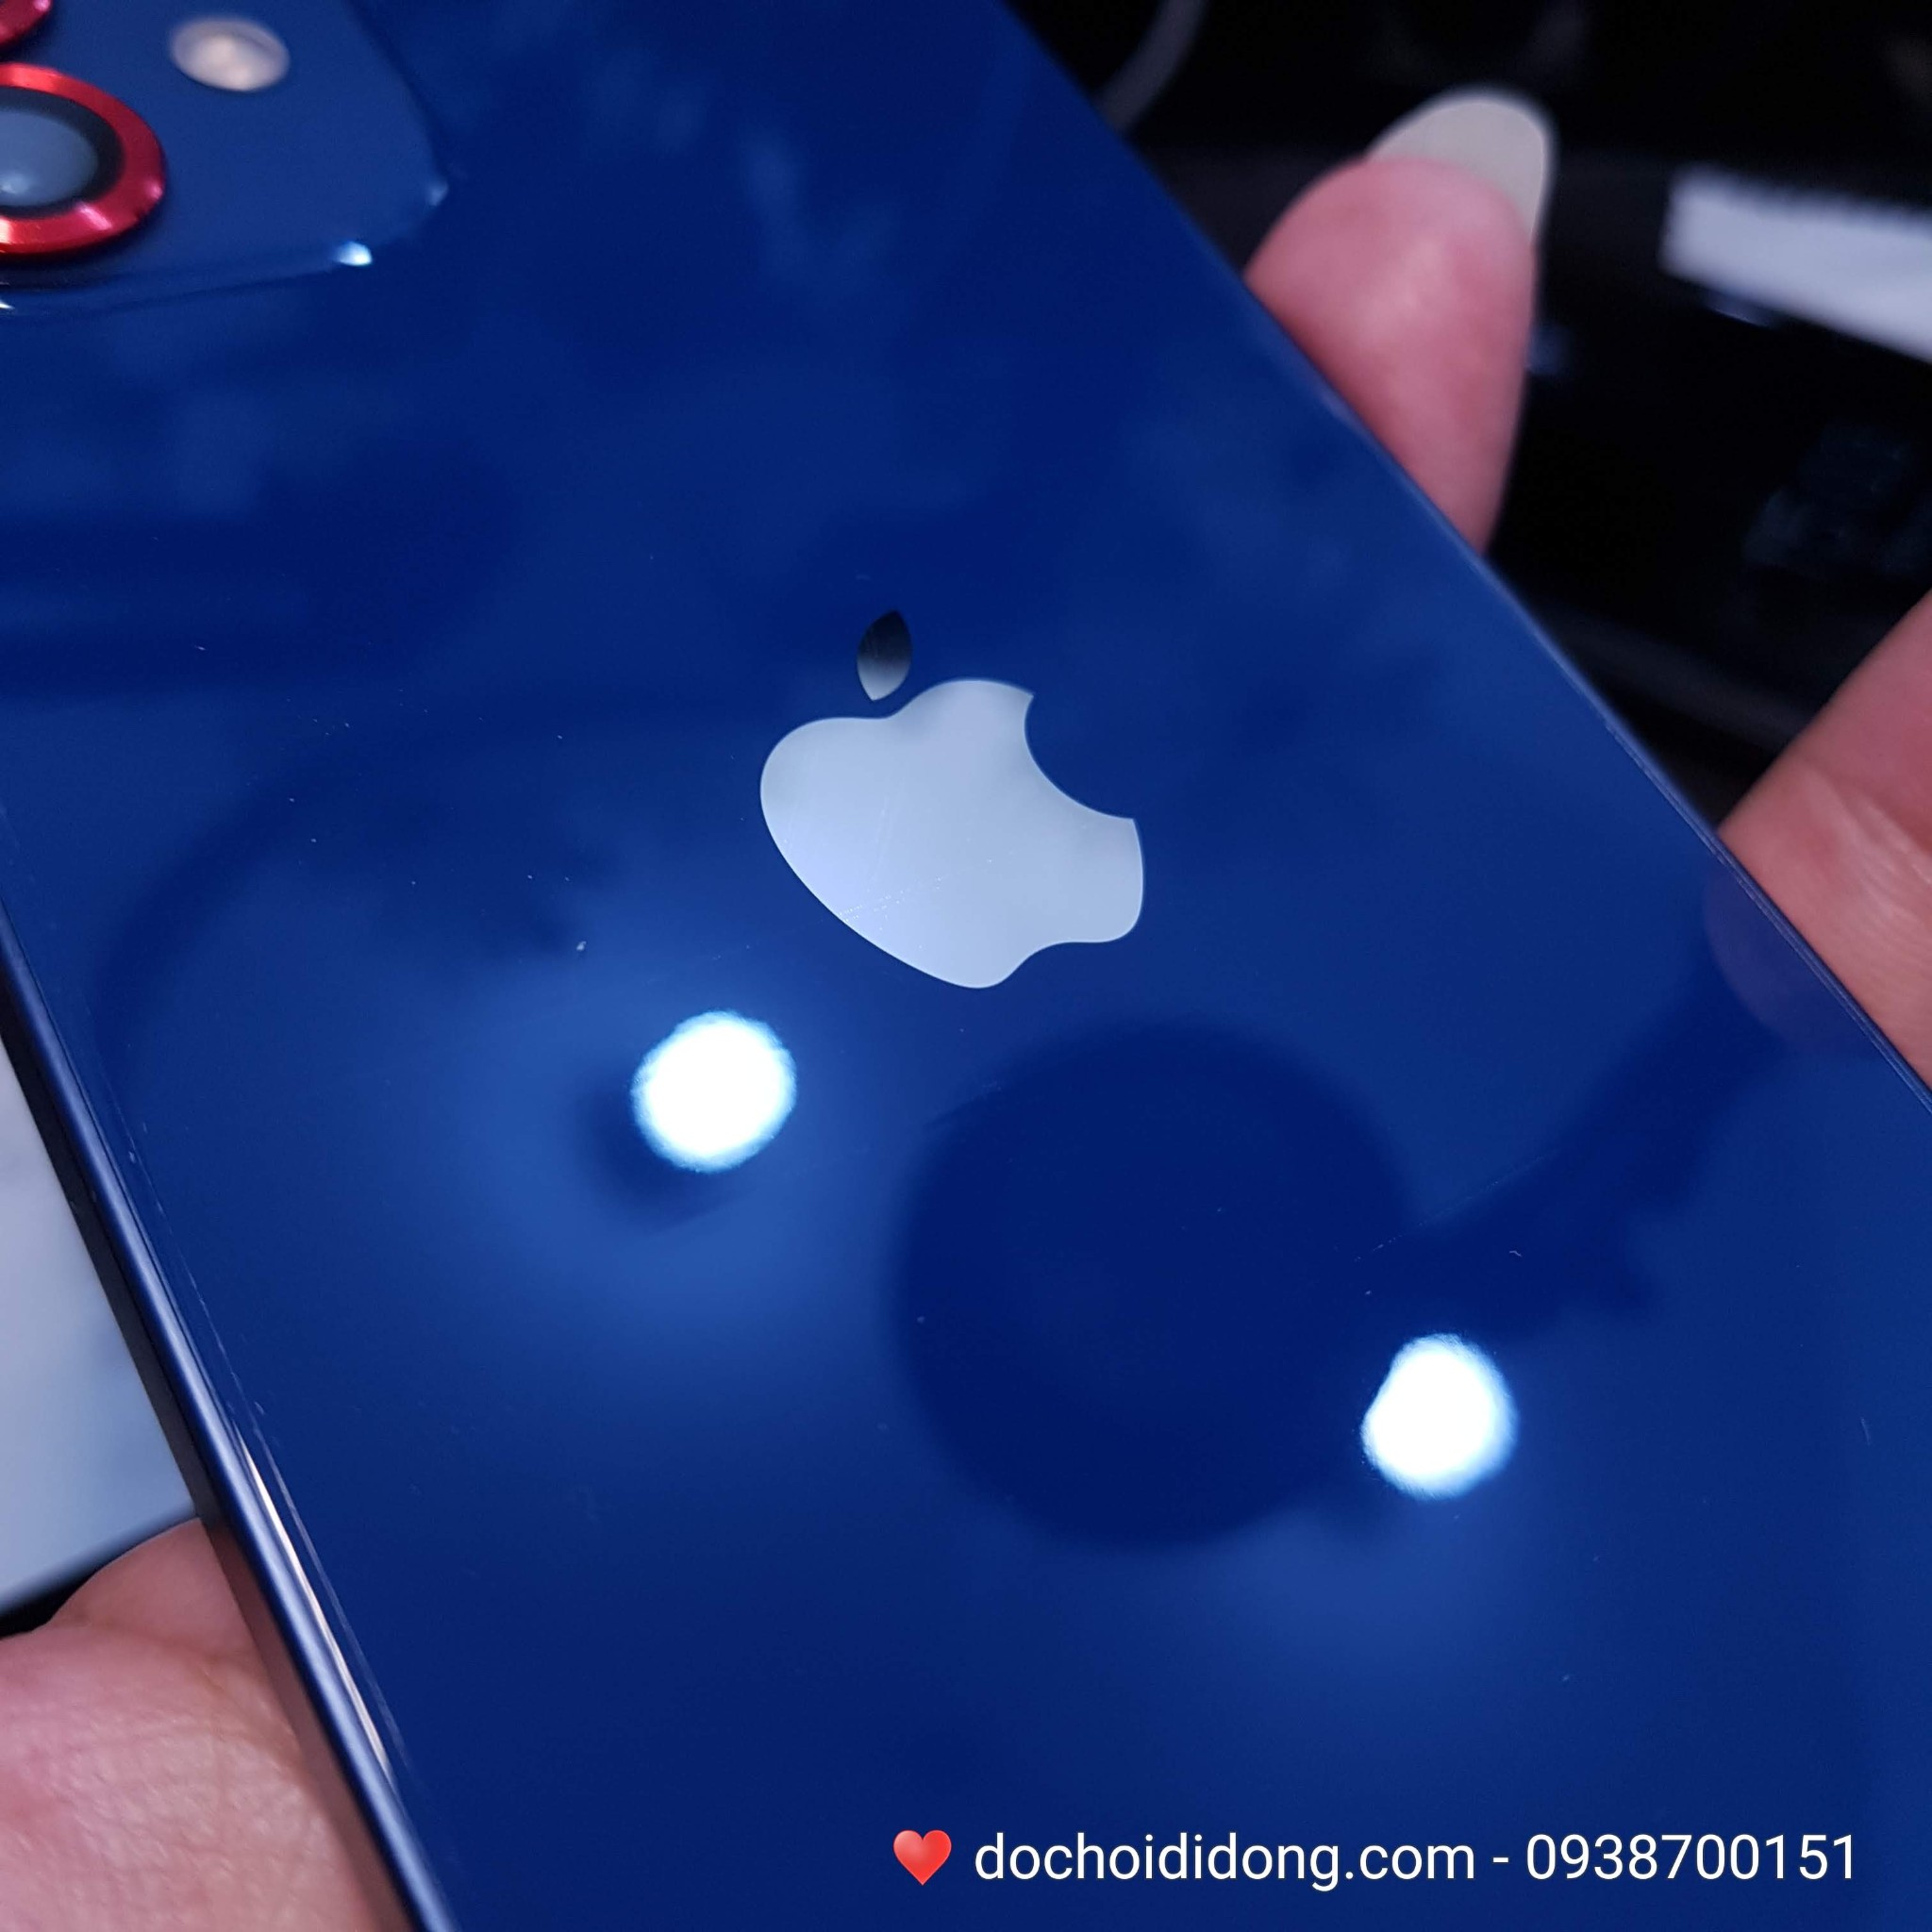 mieng-dan-ppf-rock-iphone-12-trong-nham-doi-mau-cao-cap